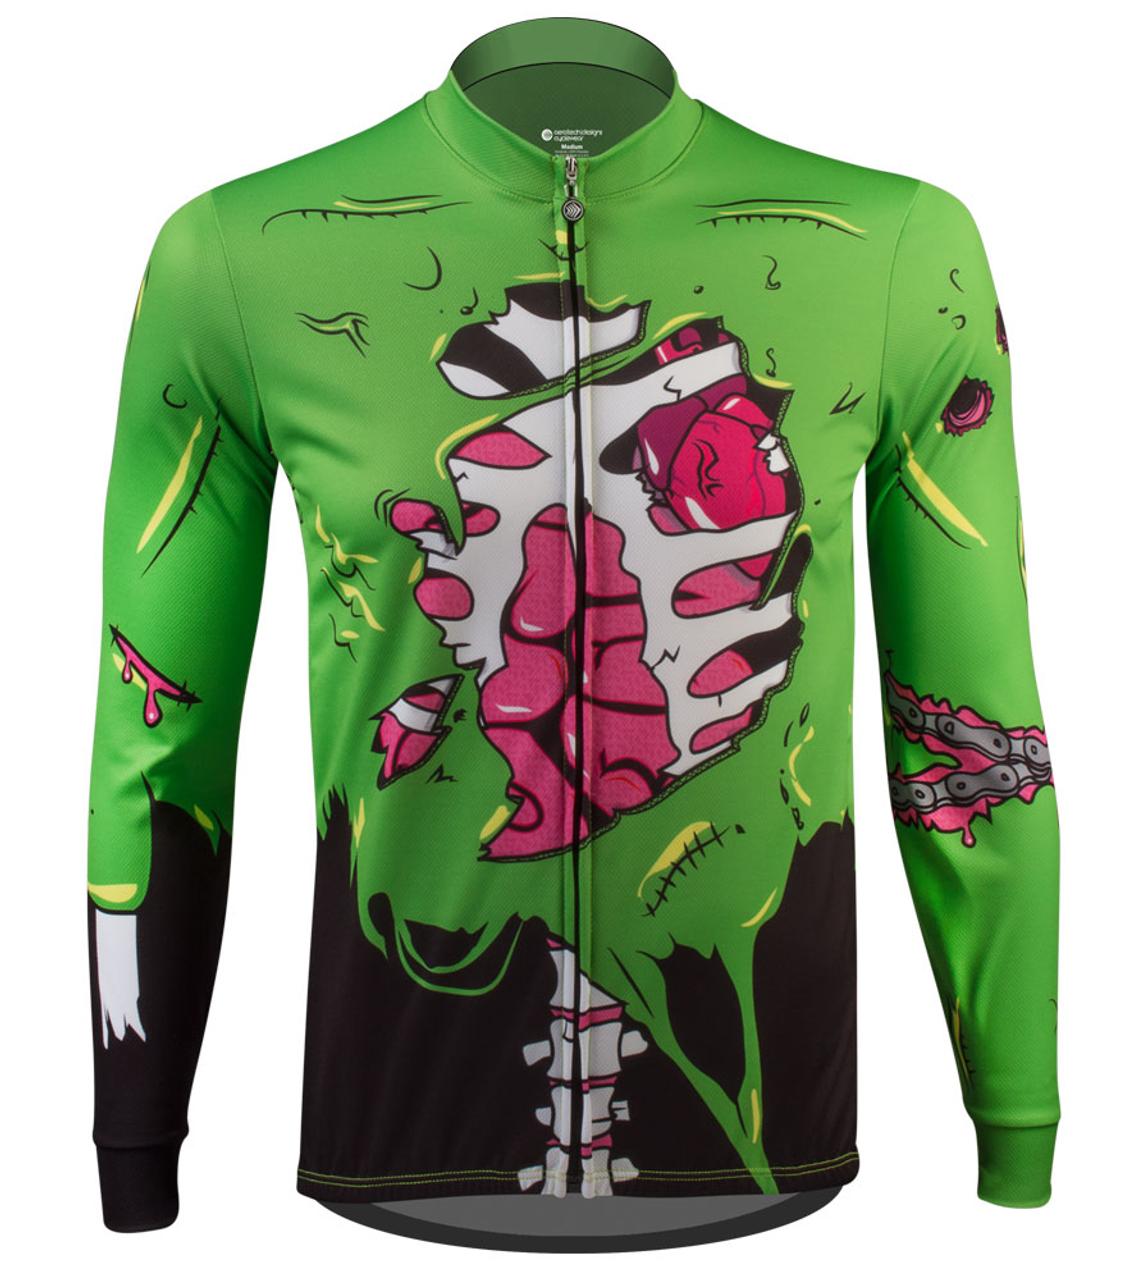 0eaf1ffee Aero Tech Halloween Long Sleeve Zombie Cycling Jersey Front View